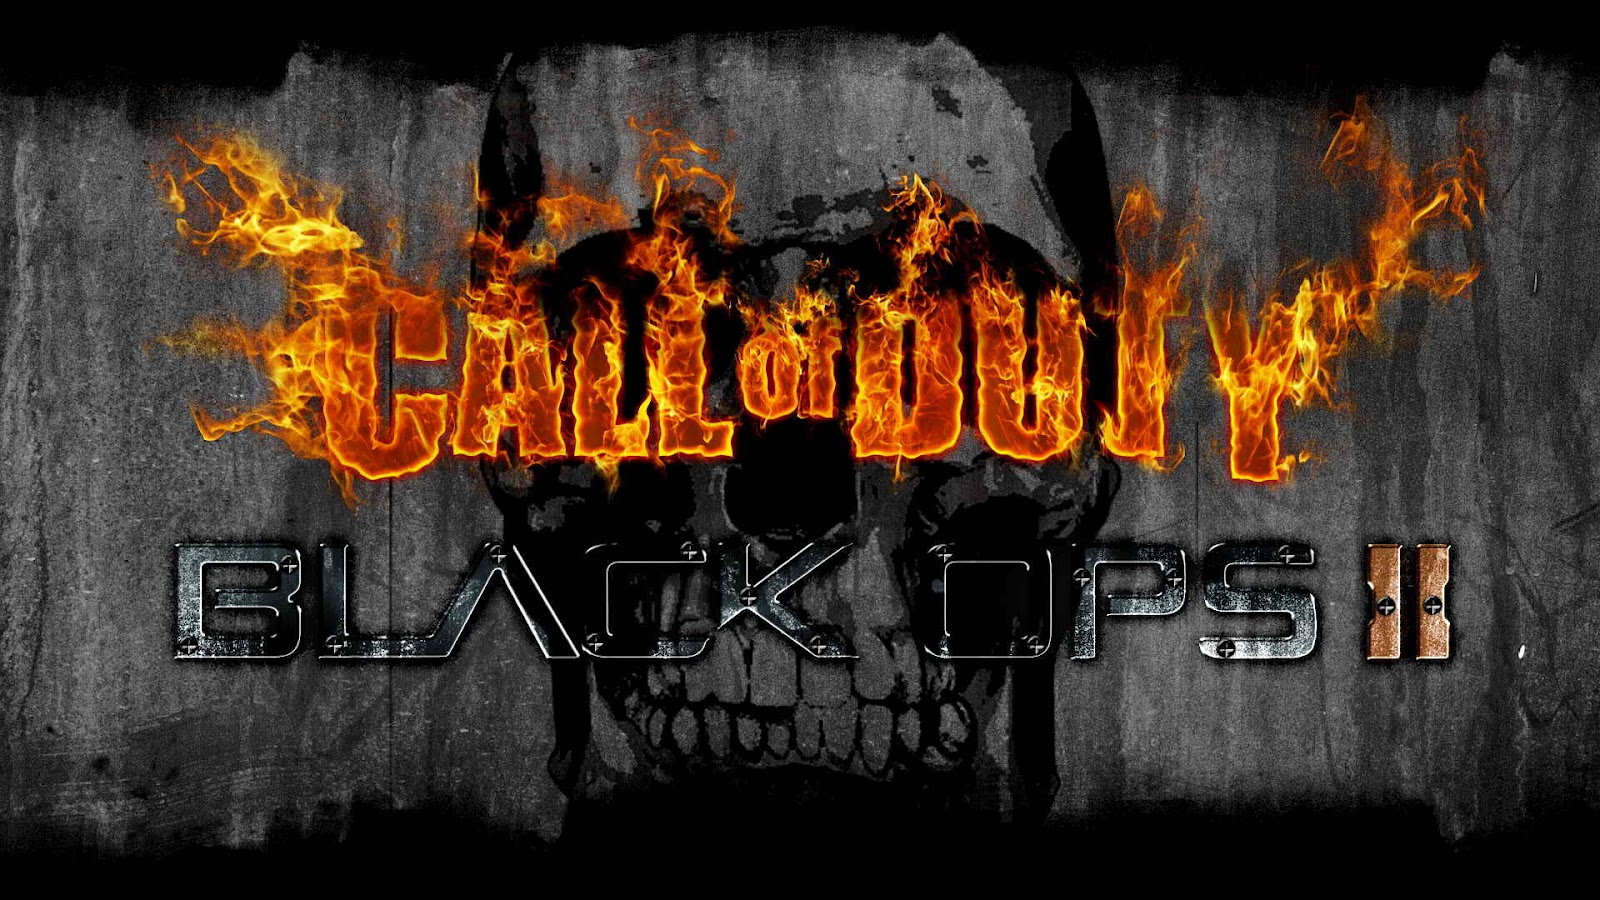 Call Of Duty Bo2 Wallpaper: Trololo Blogg: Full Hd Wallpaper Black Ops